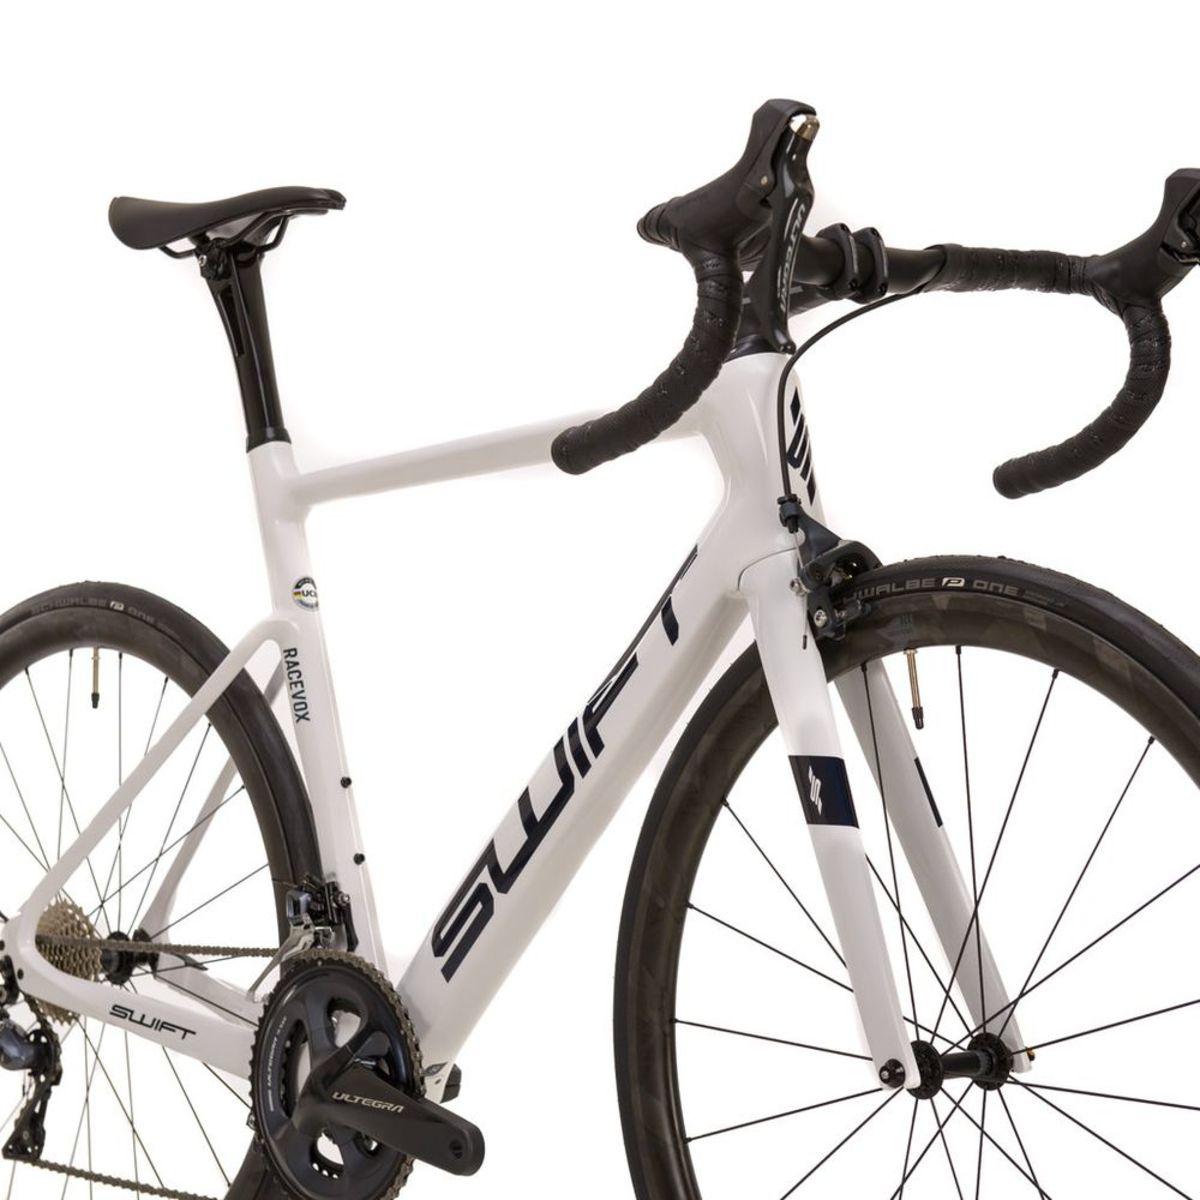 Bicicleta SPEED Swift Carbon RACEVOX CALIPER 2021/22 Ultegra Roda Carbono T/S (49CM)